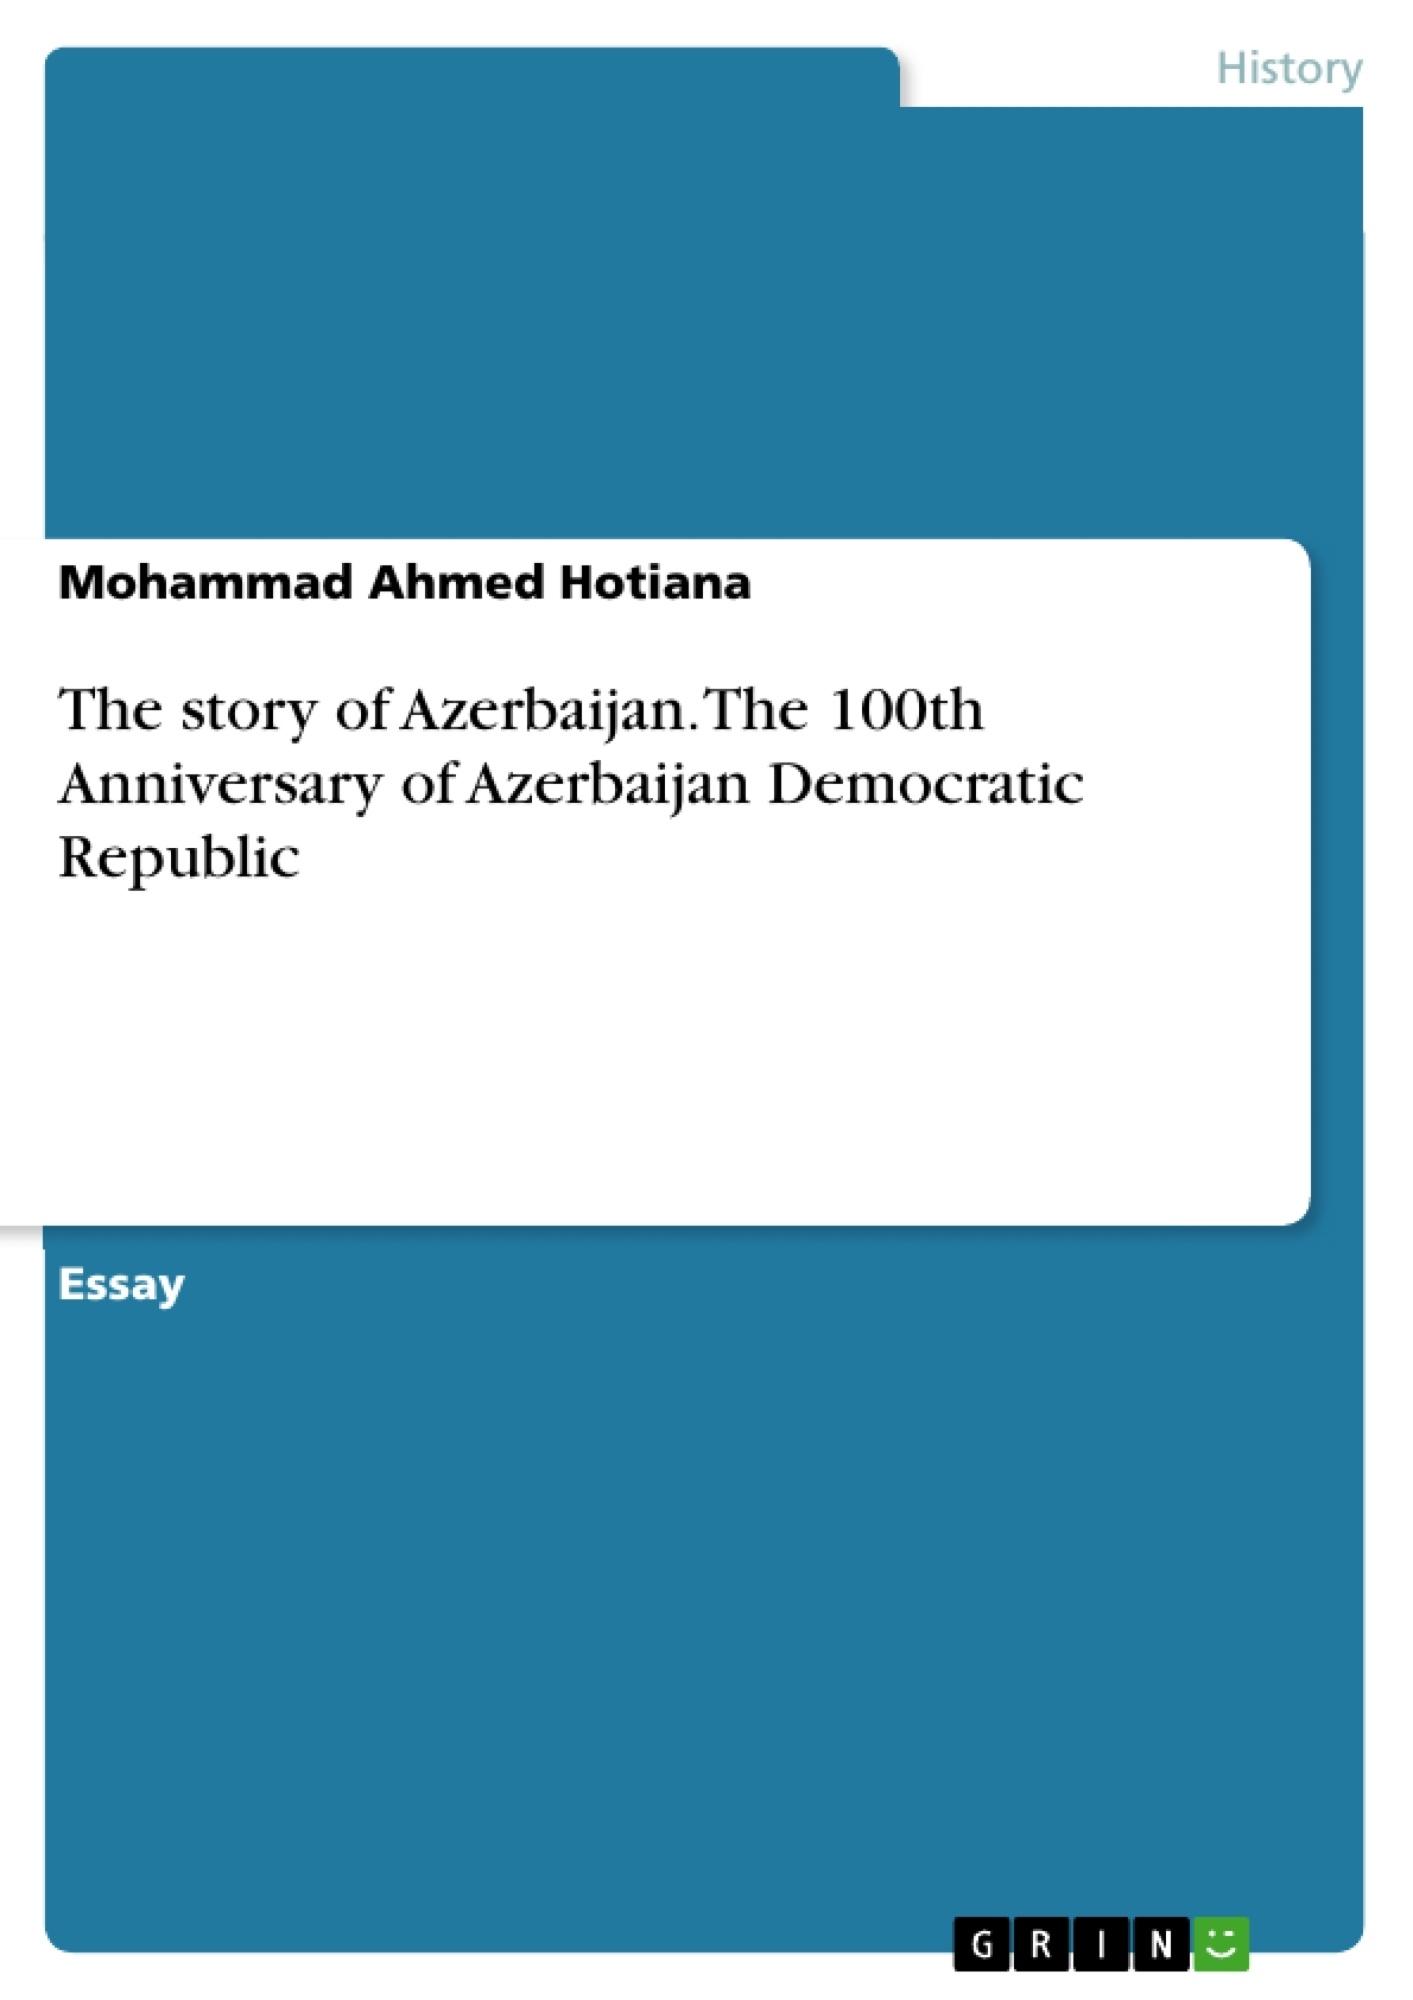 Title: The story of Azerbaijan. The 100th Anniversary of Azerbaijan Democratic Republic